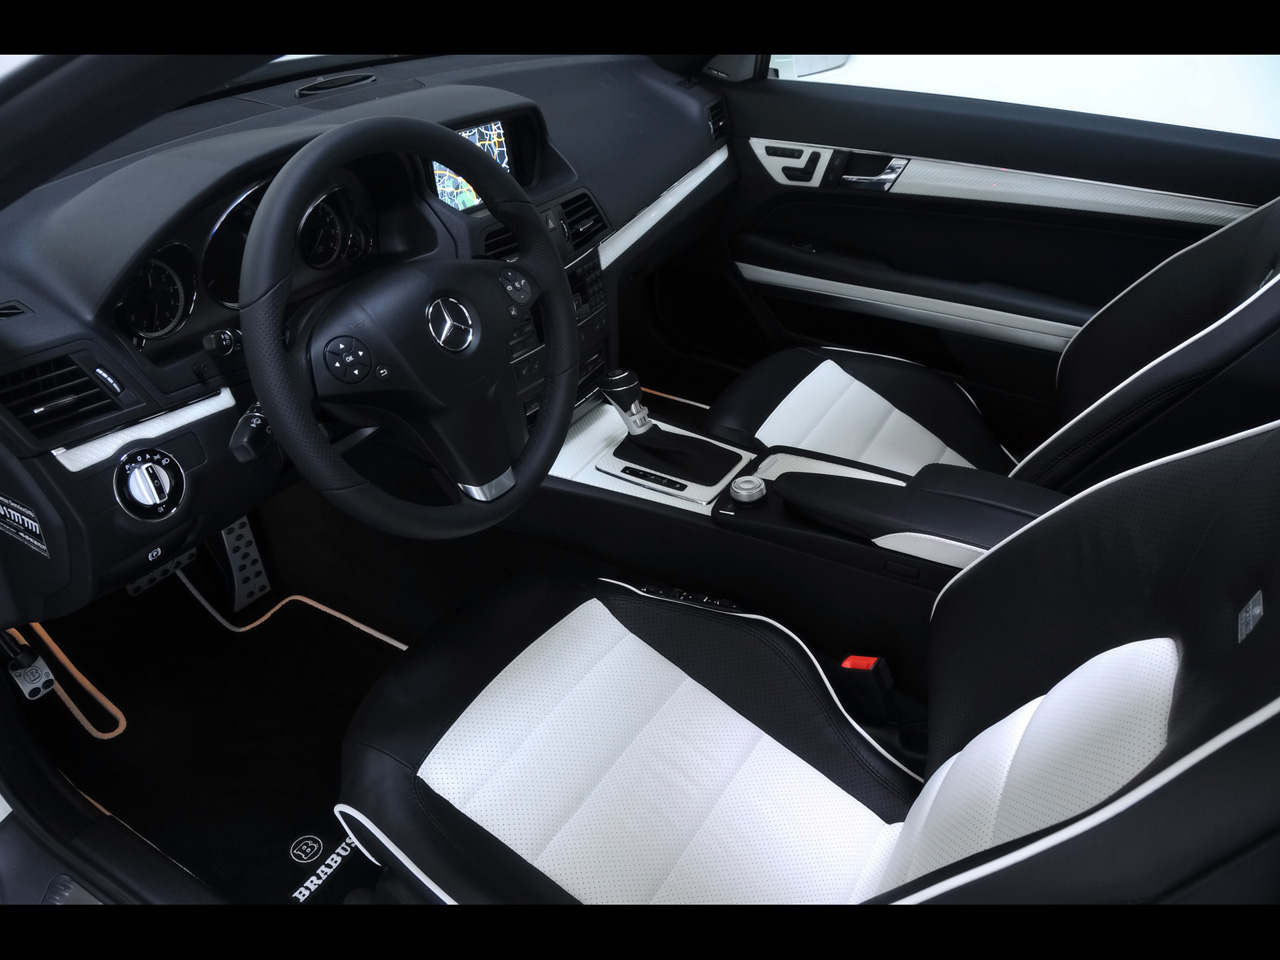 Brabus mercedes benz e class coupe interior mercedes tuning mag - Mercedes e coupe interior ...